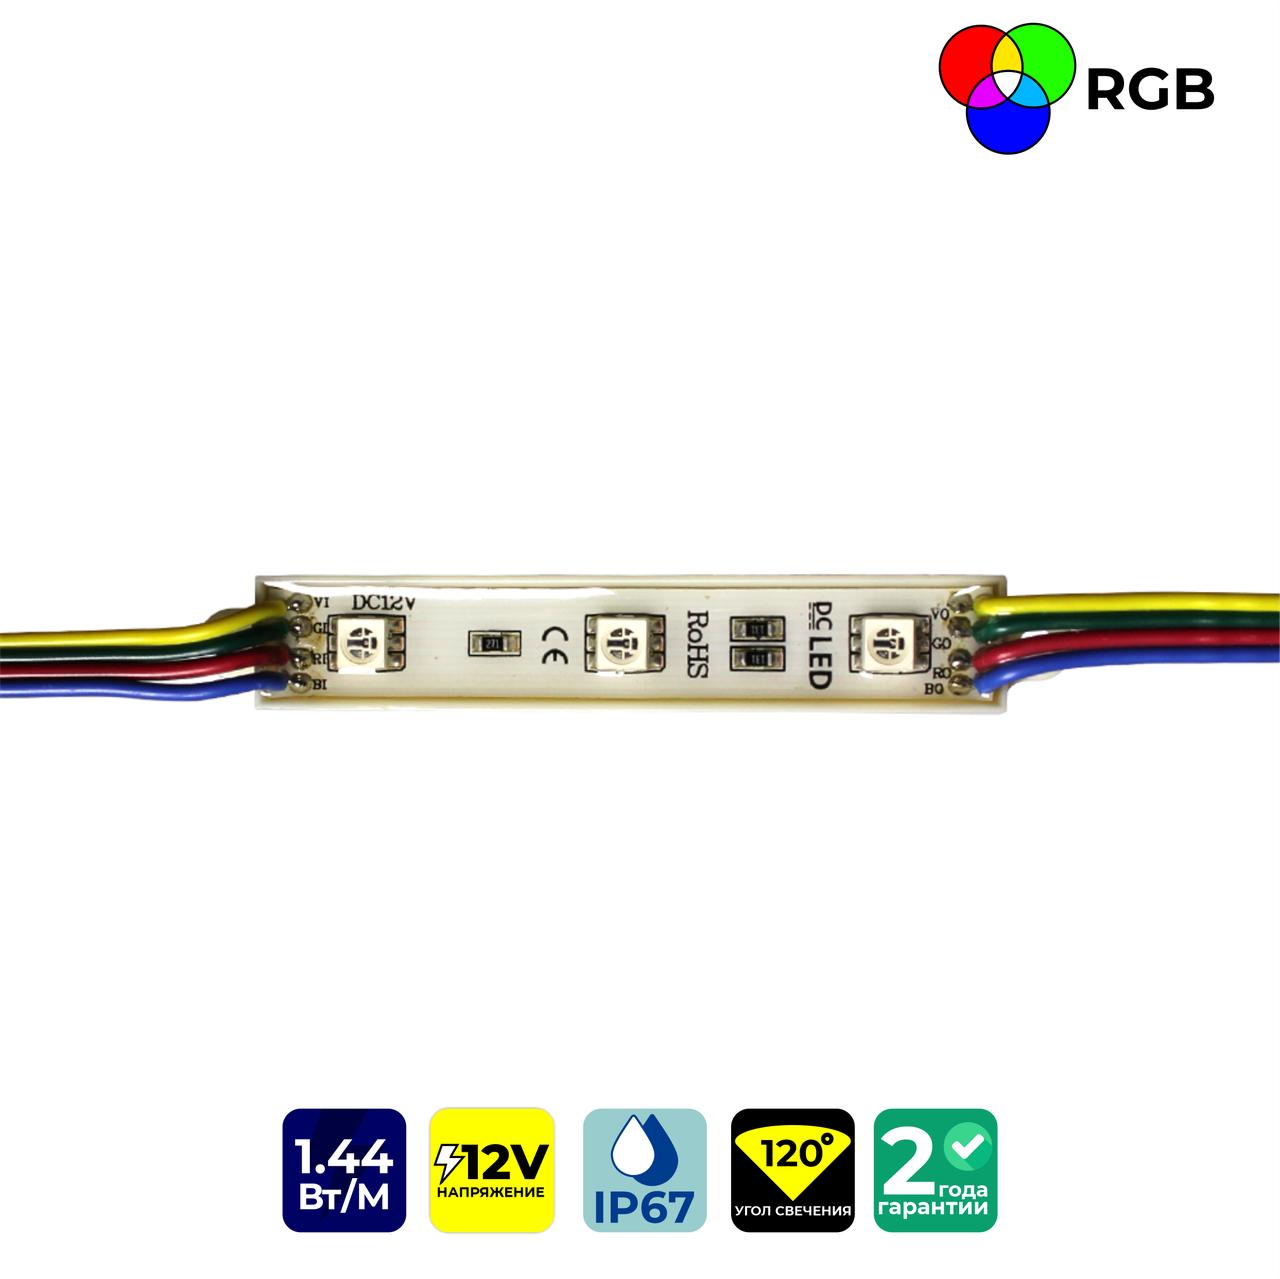 Светодиодные модули FT1275RGB3SMD5050 (IP67) 1,44W